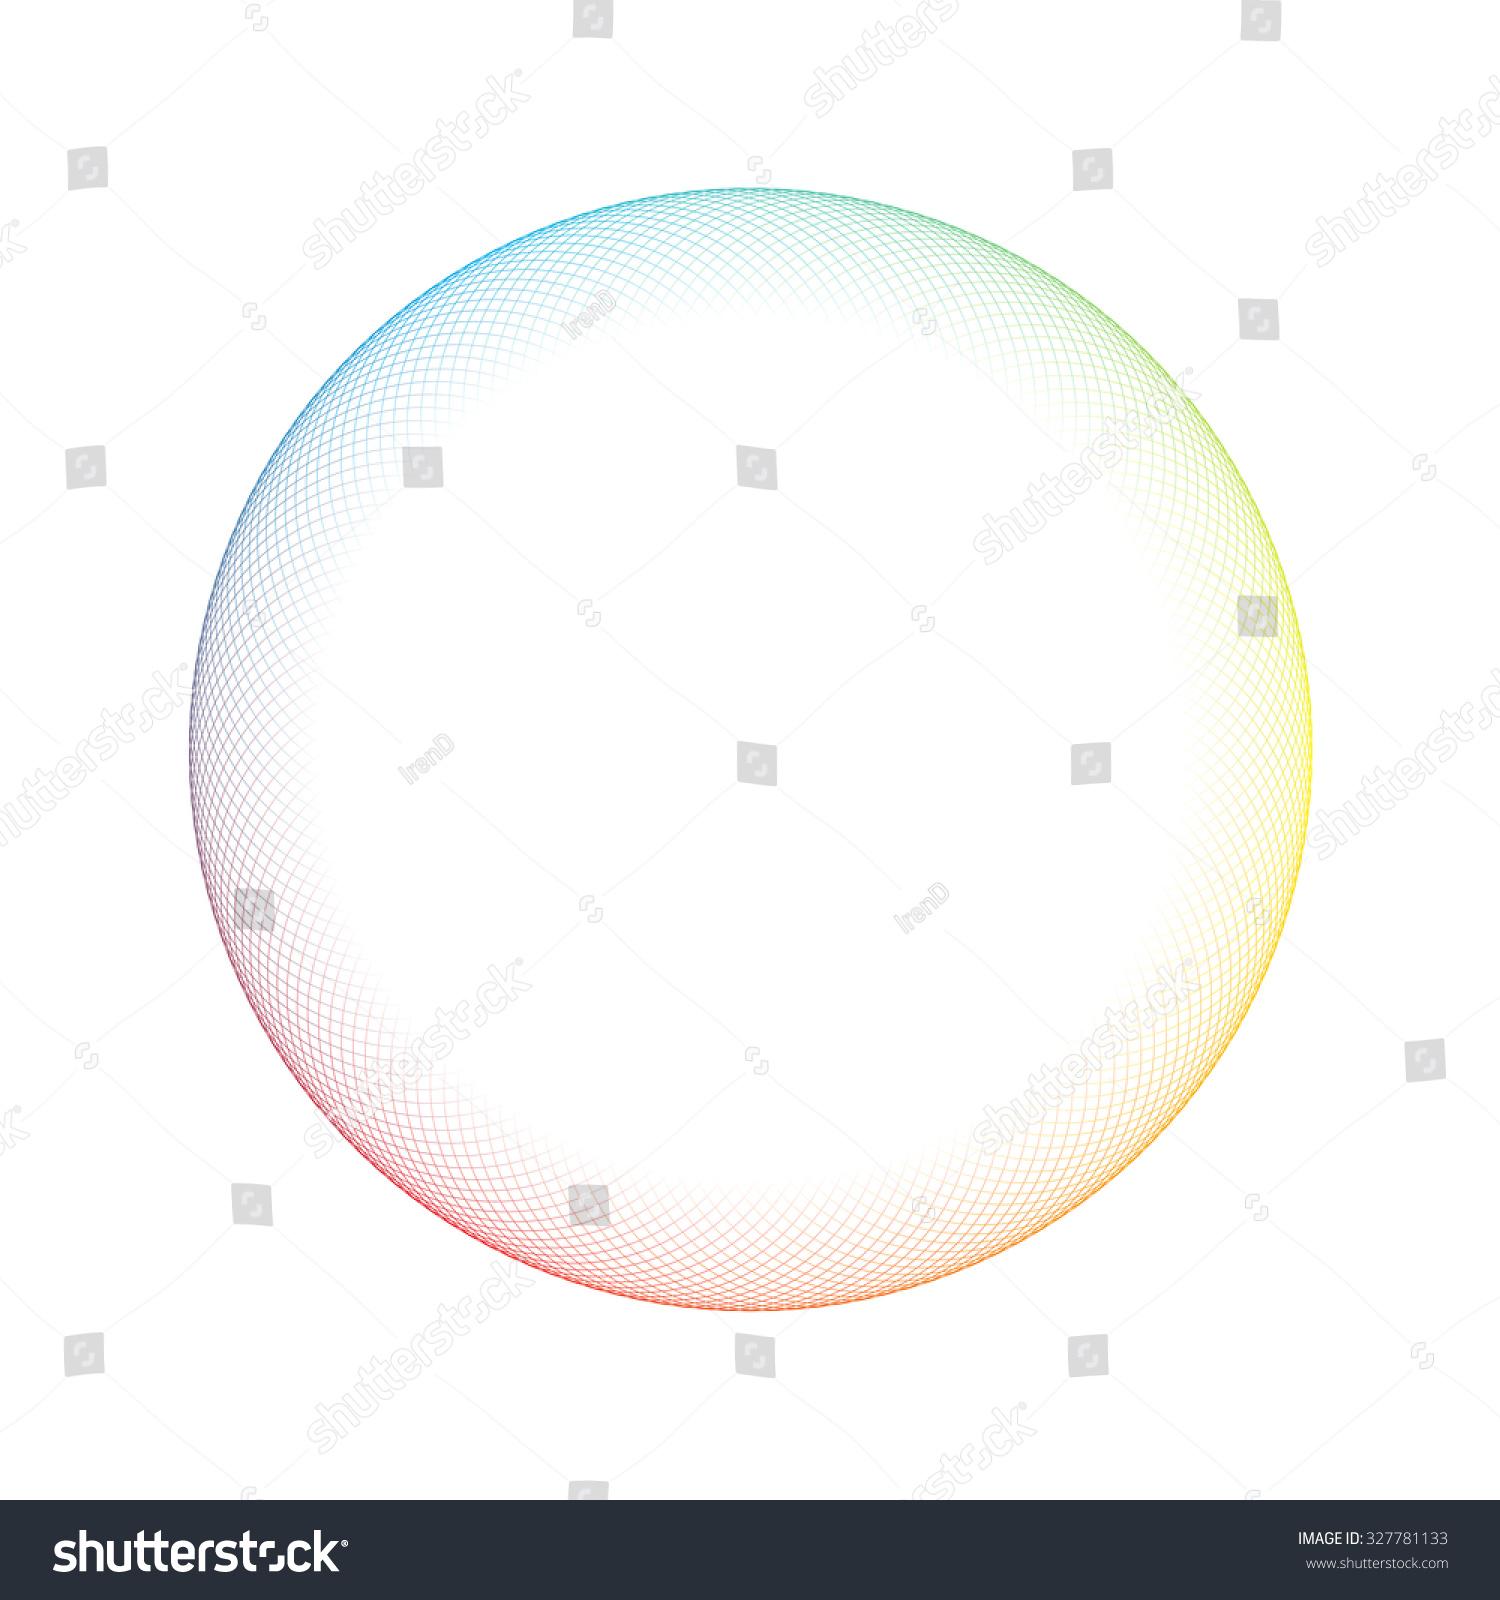 abstract design circle sector - photo #36